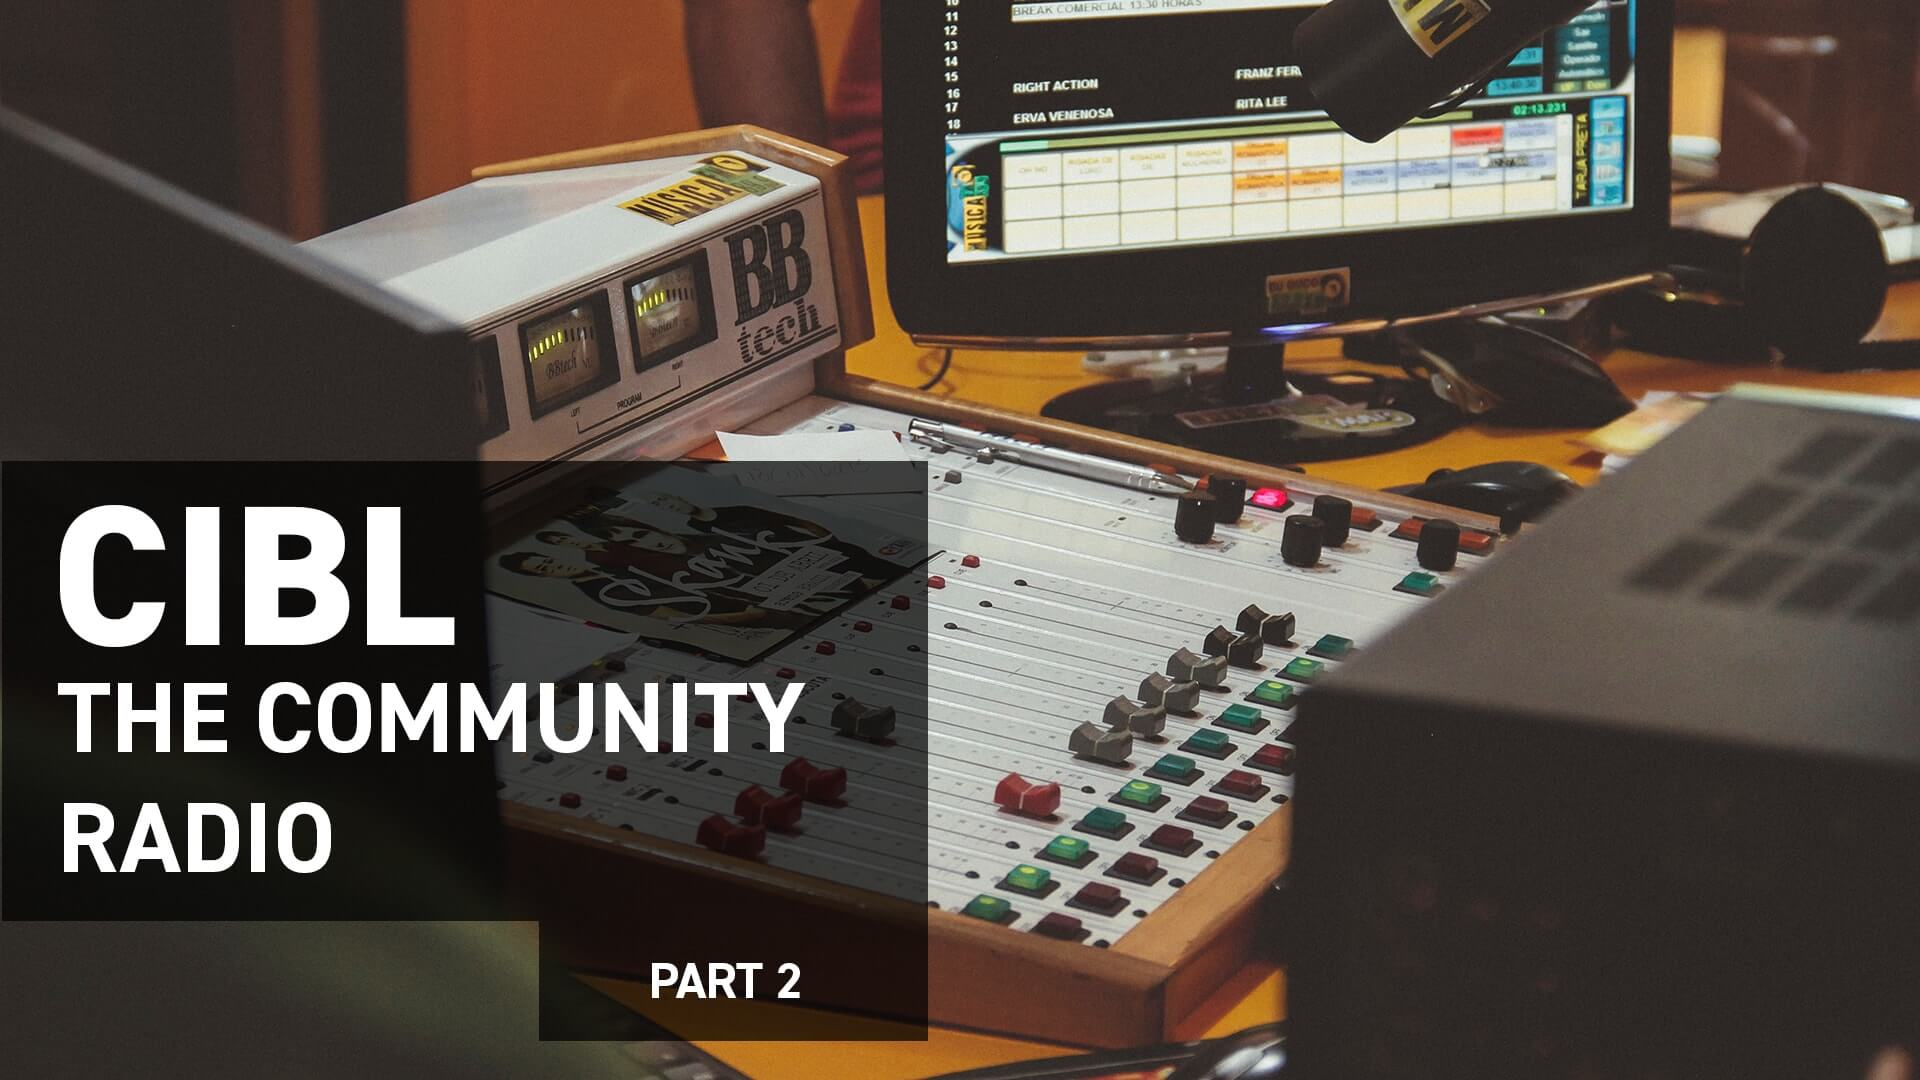 Community radio: CIBL (Part 2)